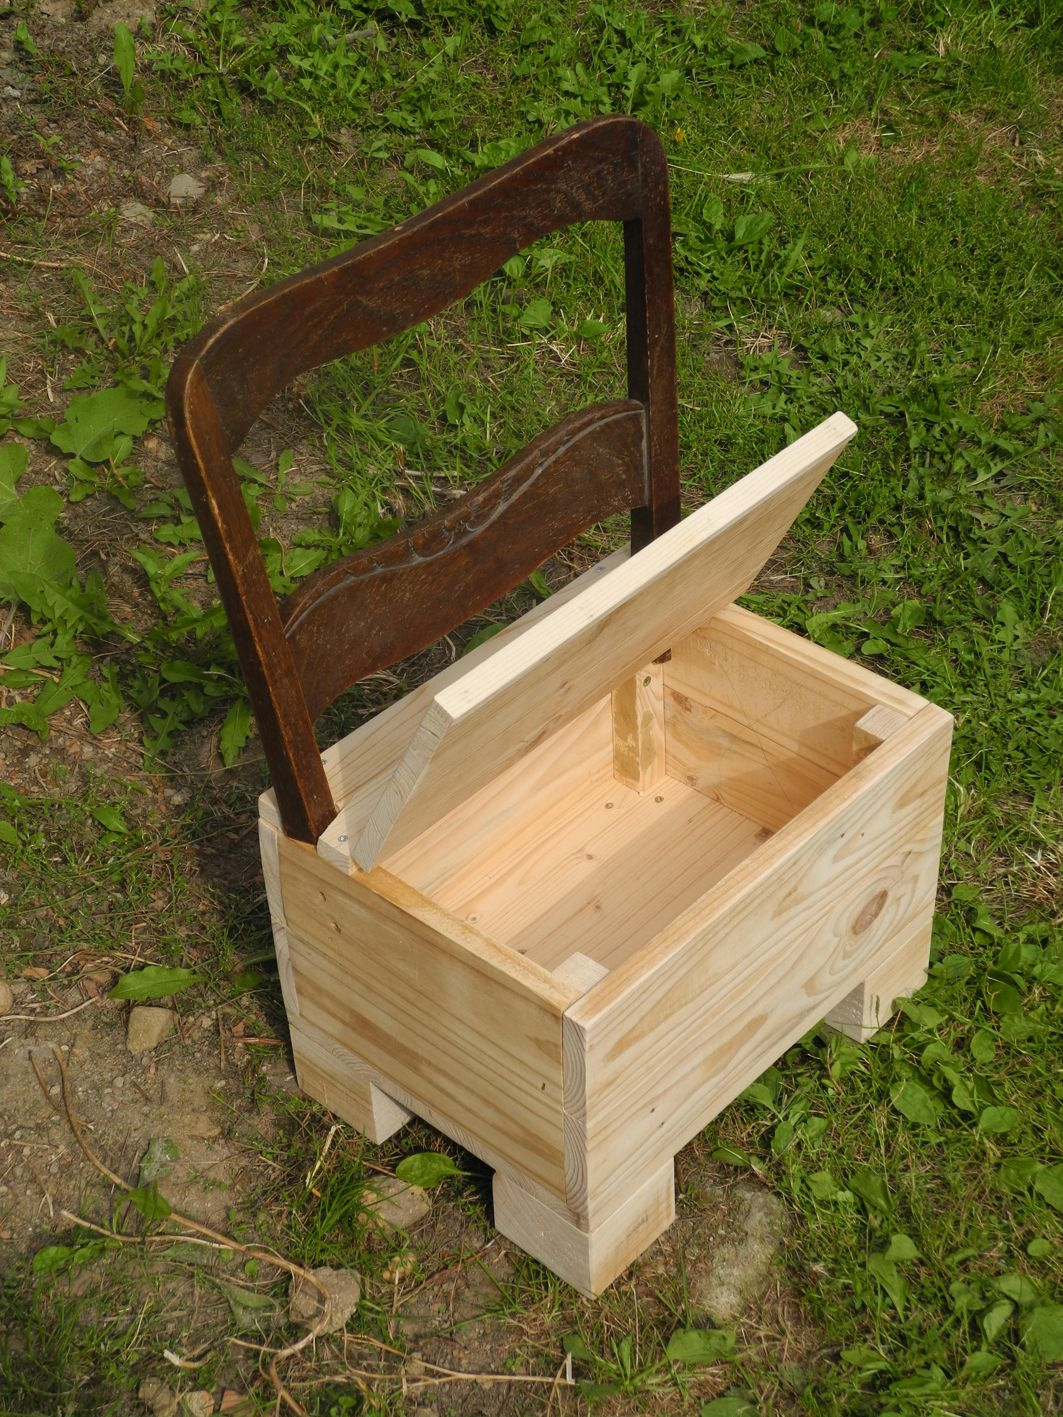 Restplätze für Kurzentschlossene: Möbel-Upcycling